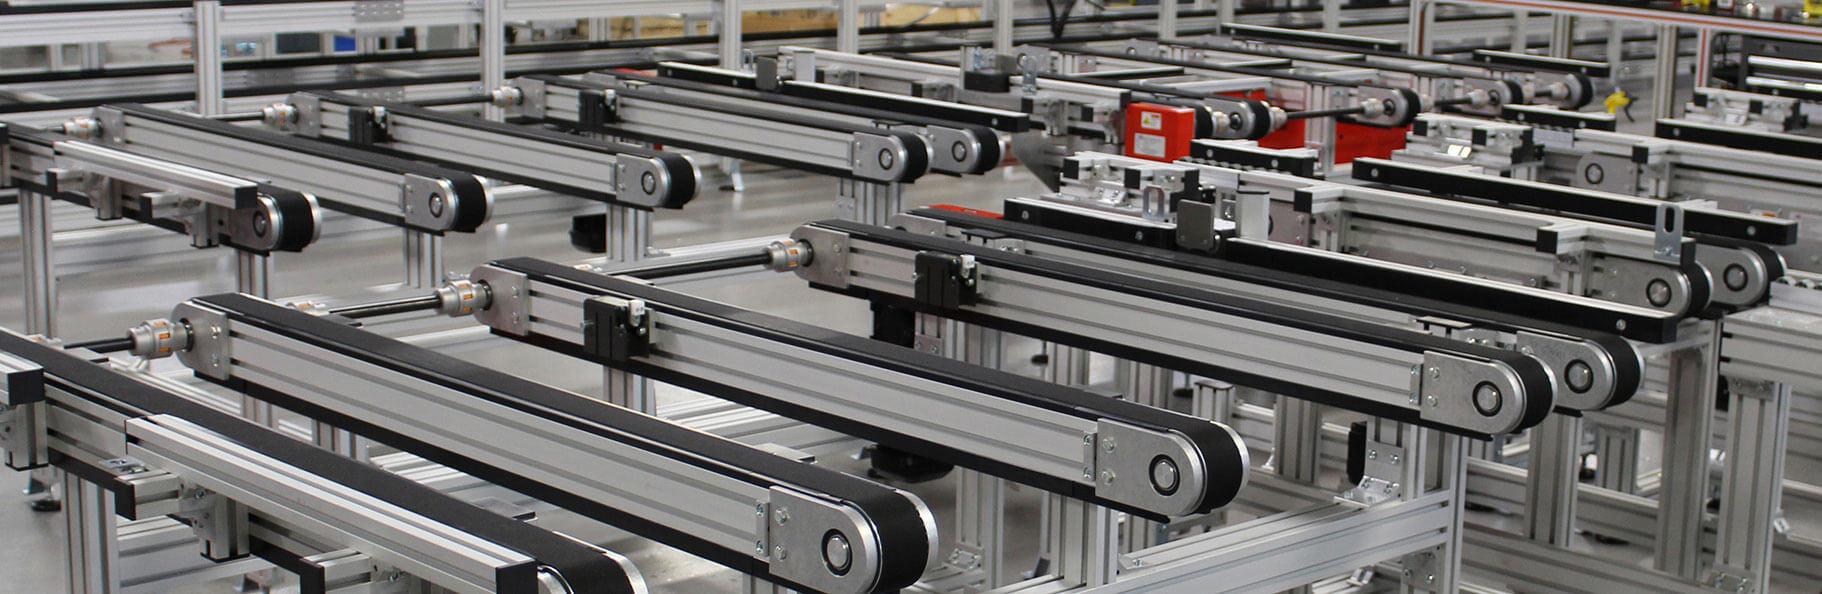 Food Service Conveyors